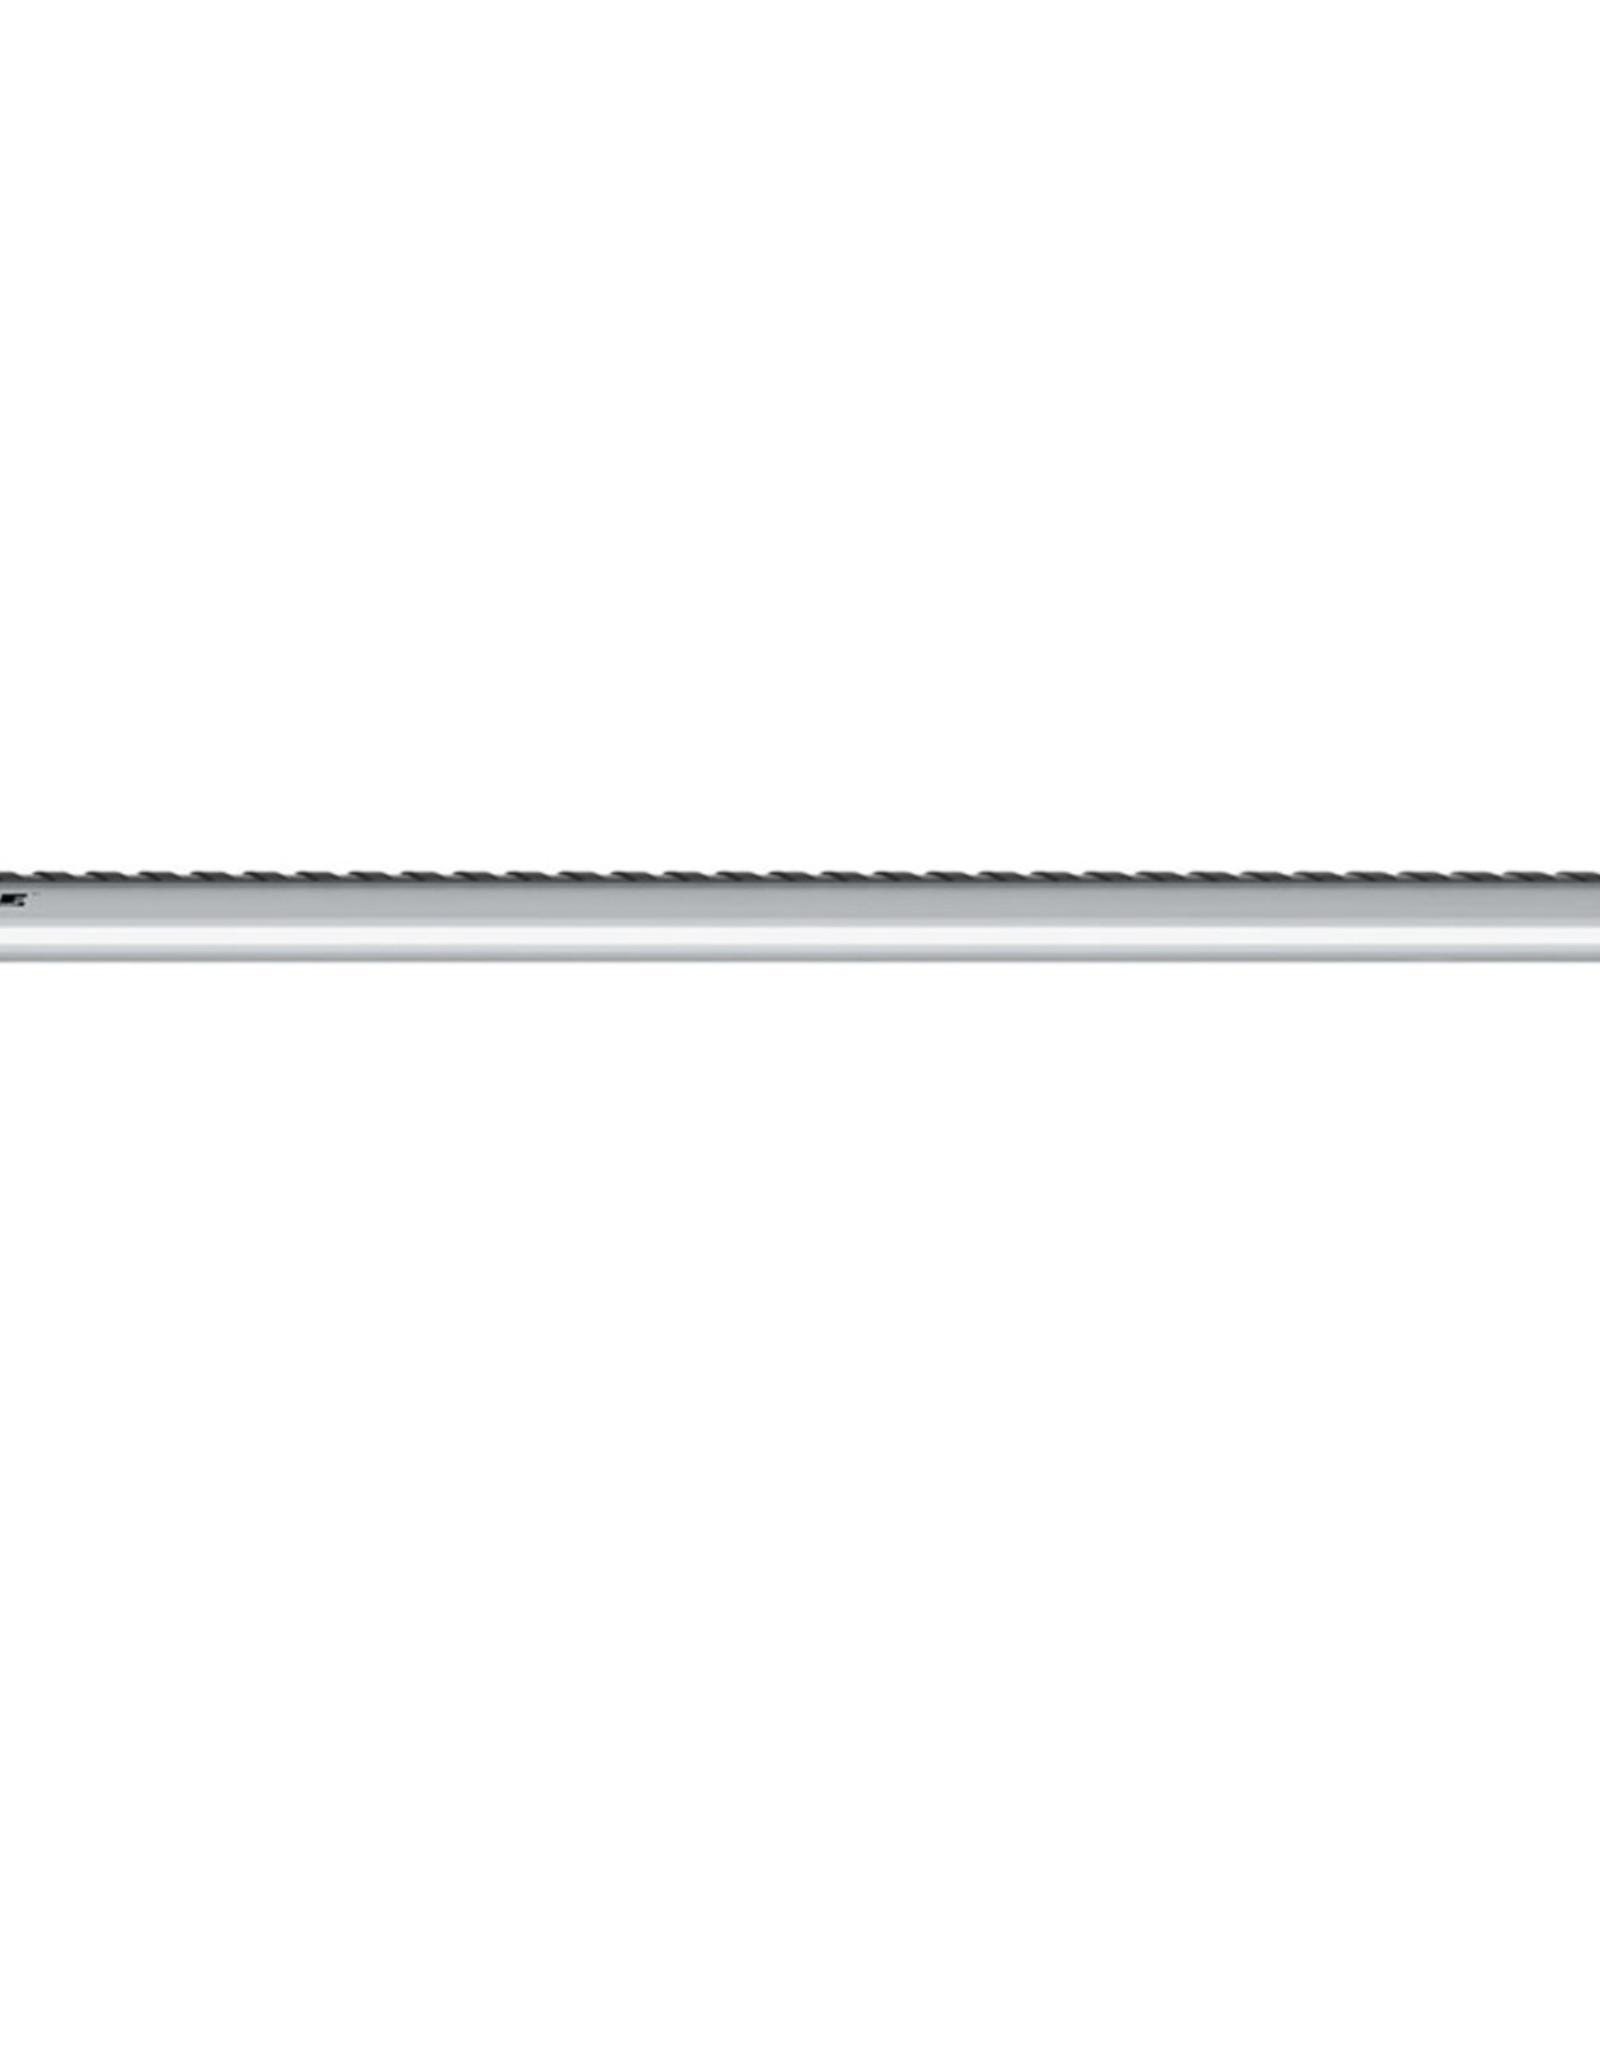 Thule Aeroblade Edge Raised Rail M SILVER